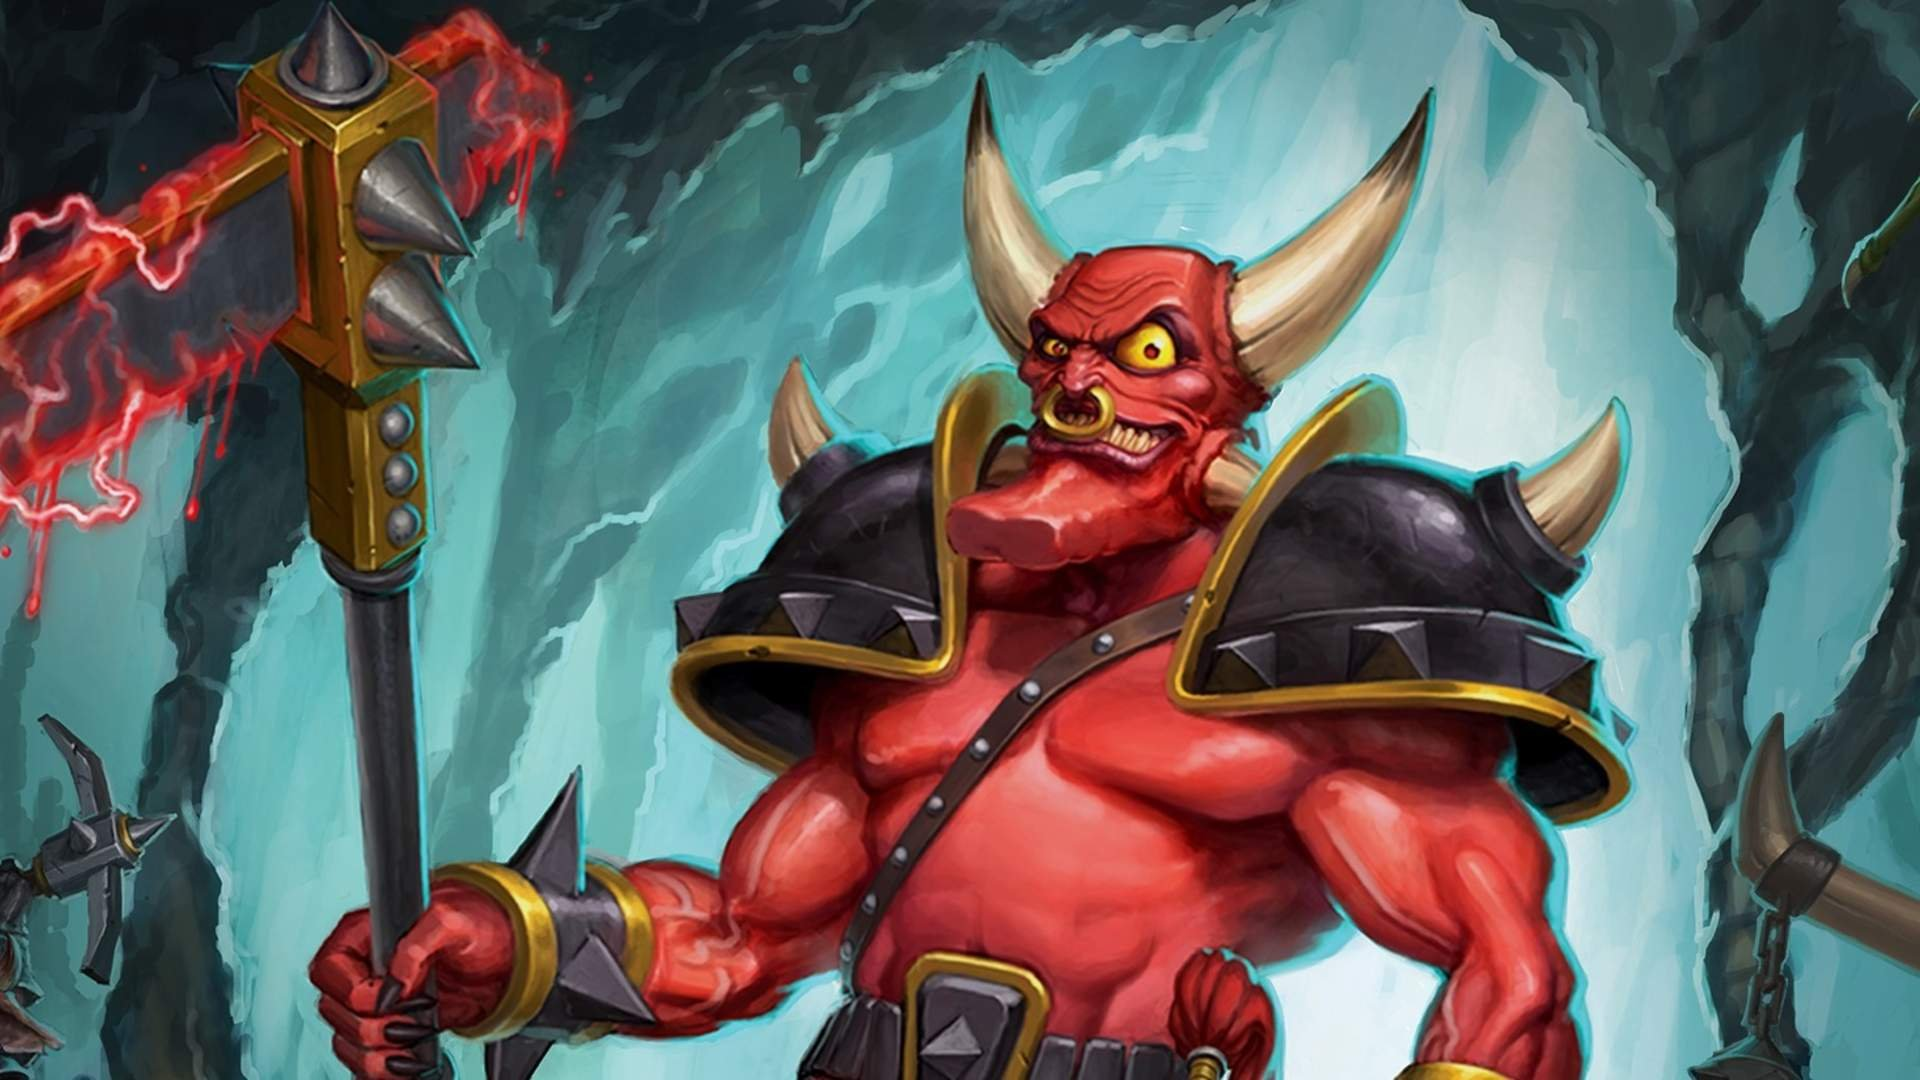 224604-dungeon-keeper.jpg